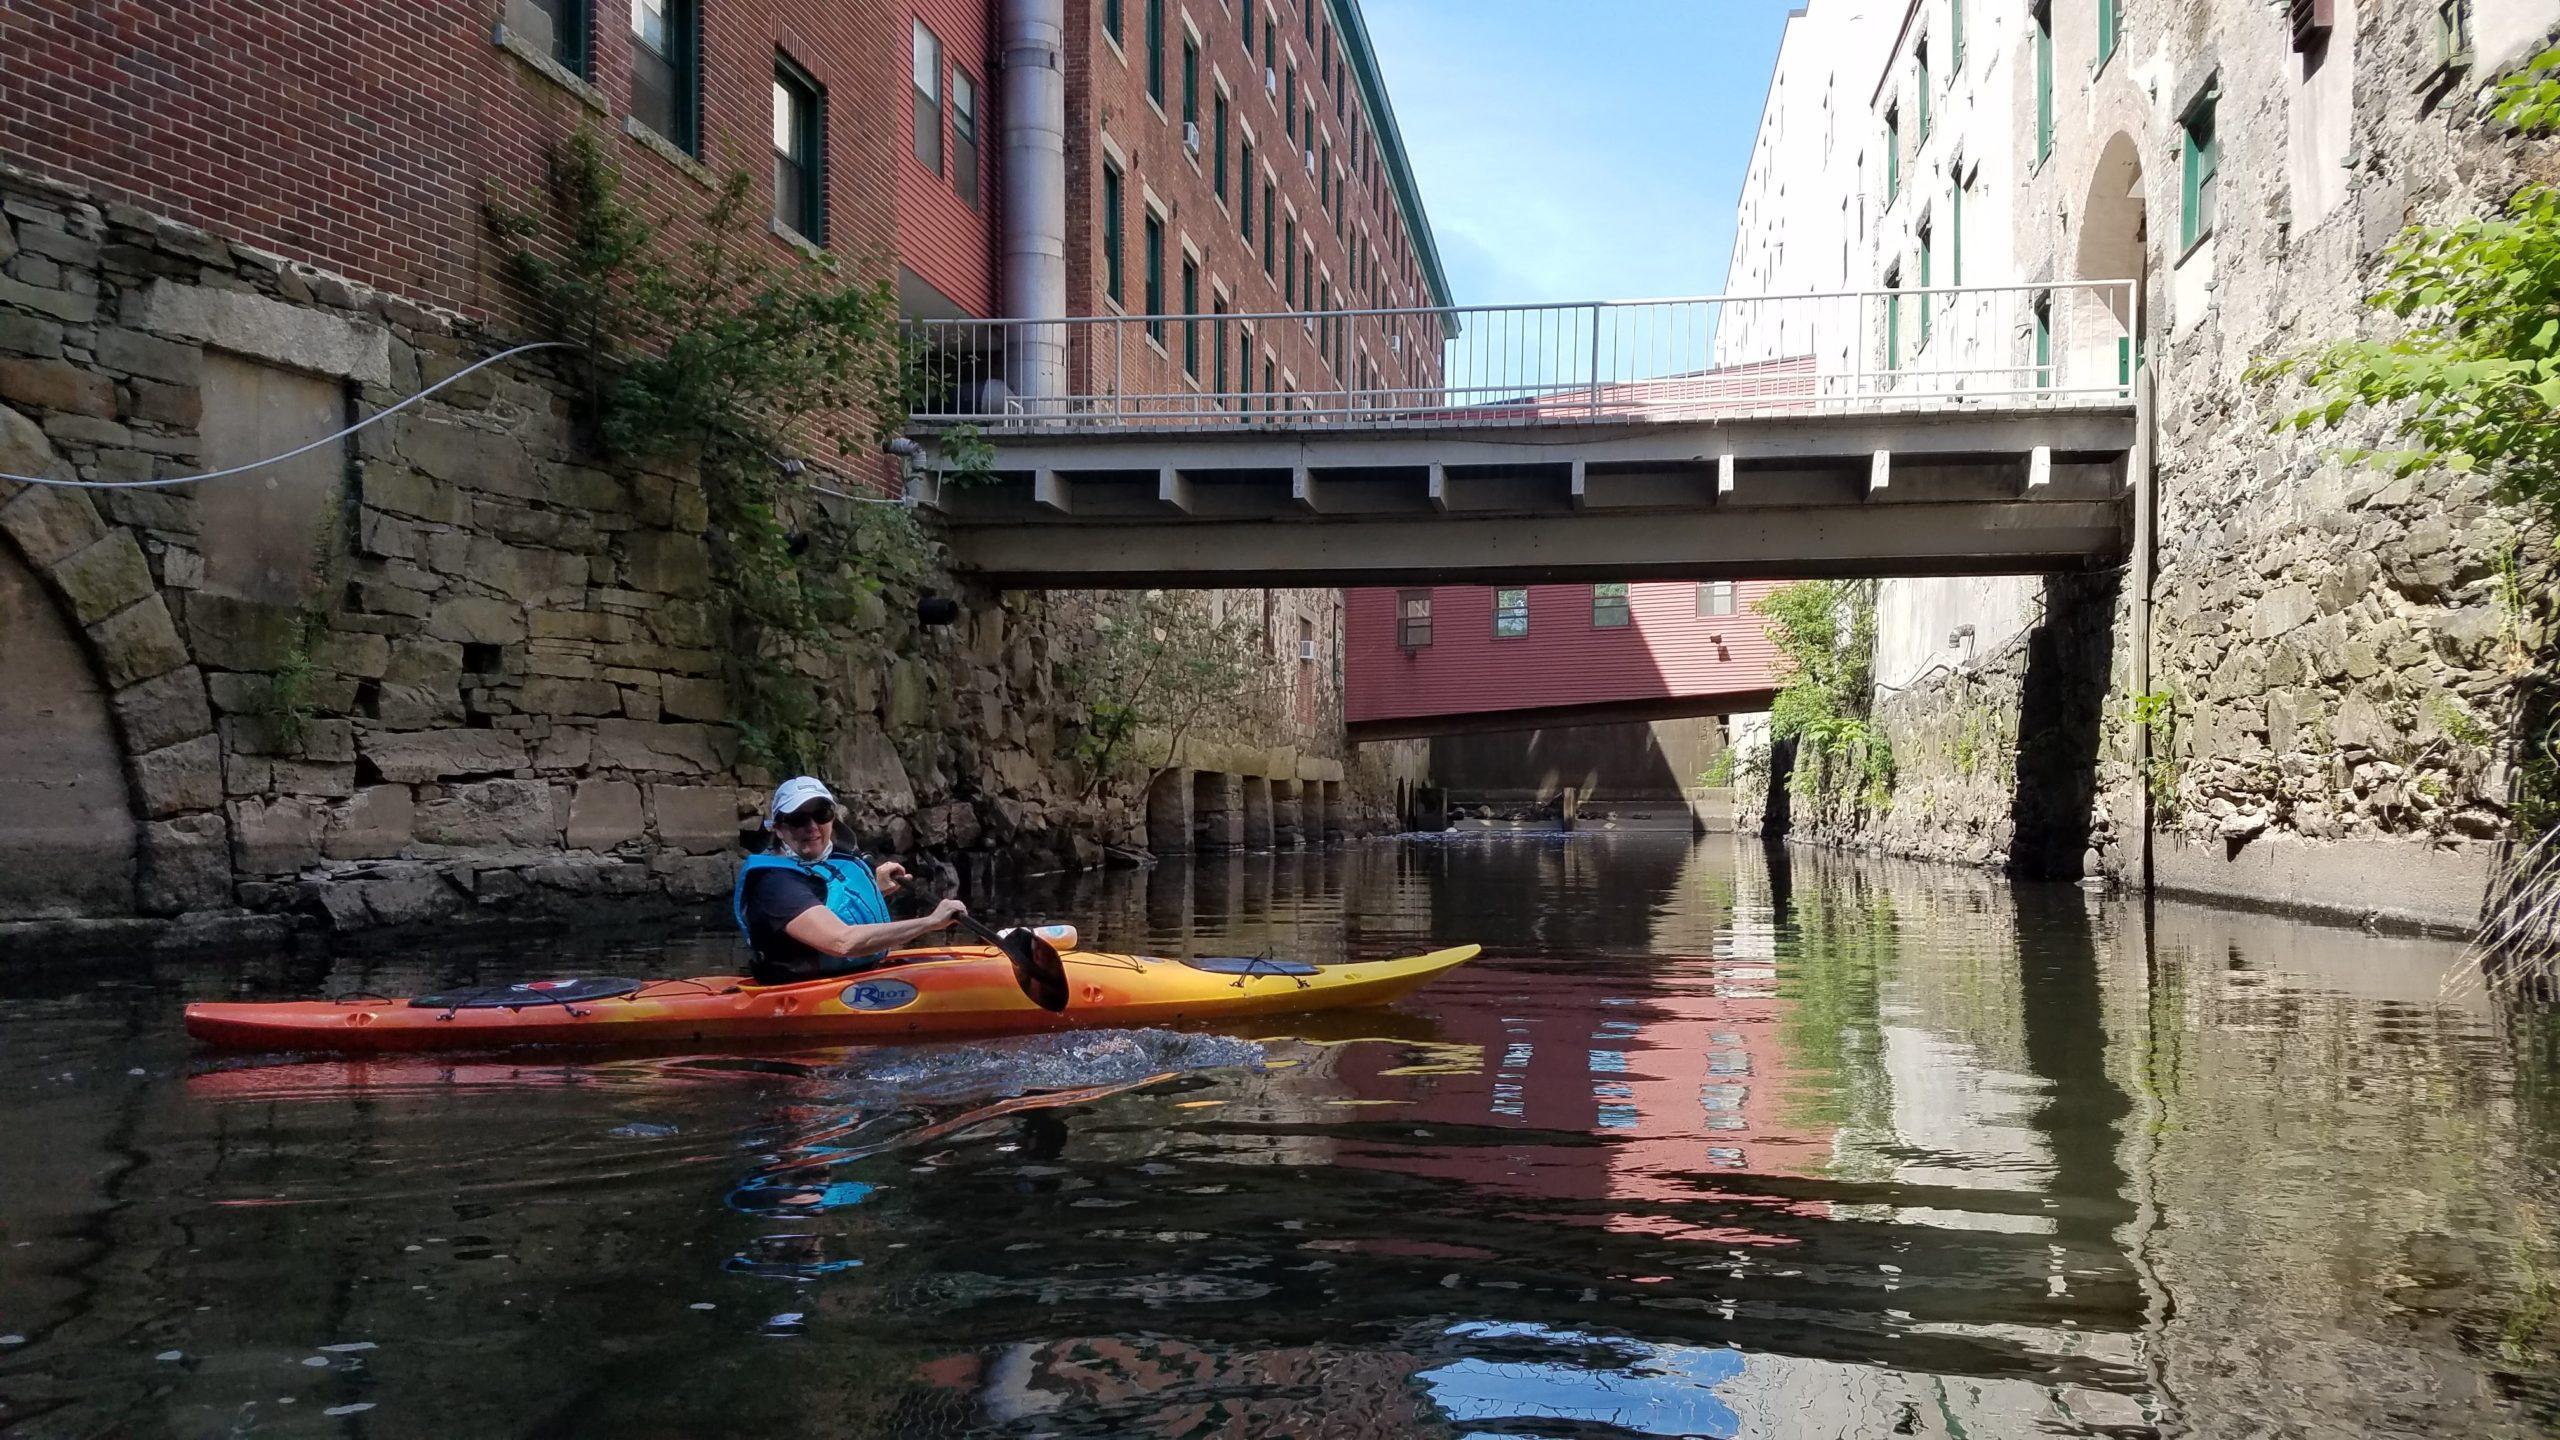 Paddling on the Blackstone River